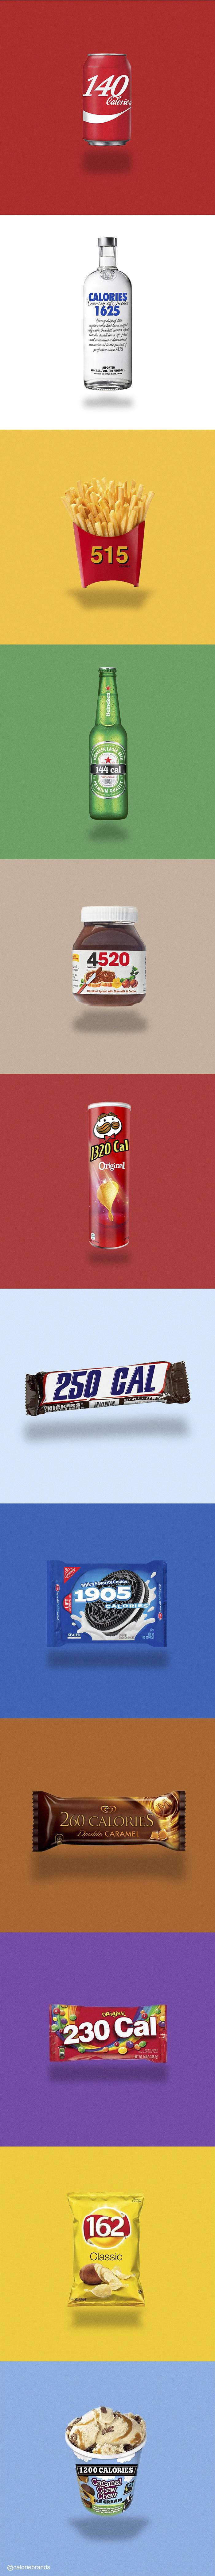 honest-product-logos-junk-food-calorie-count-caloriebrands